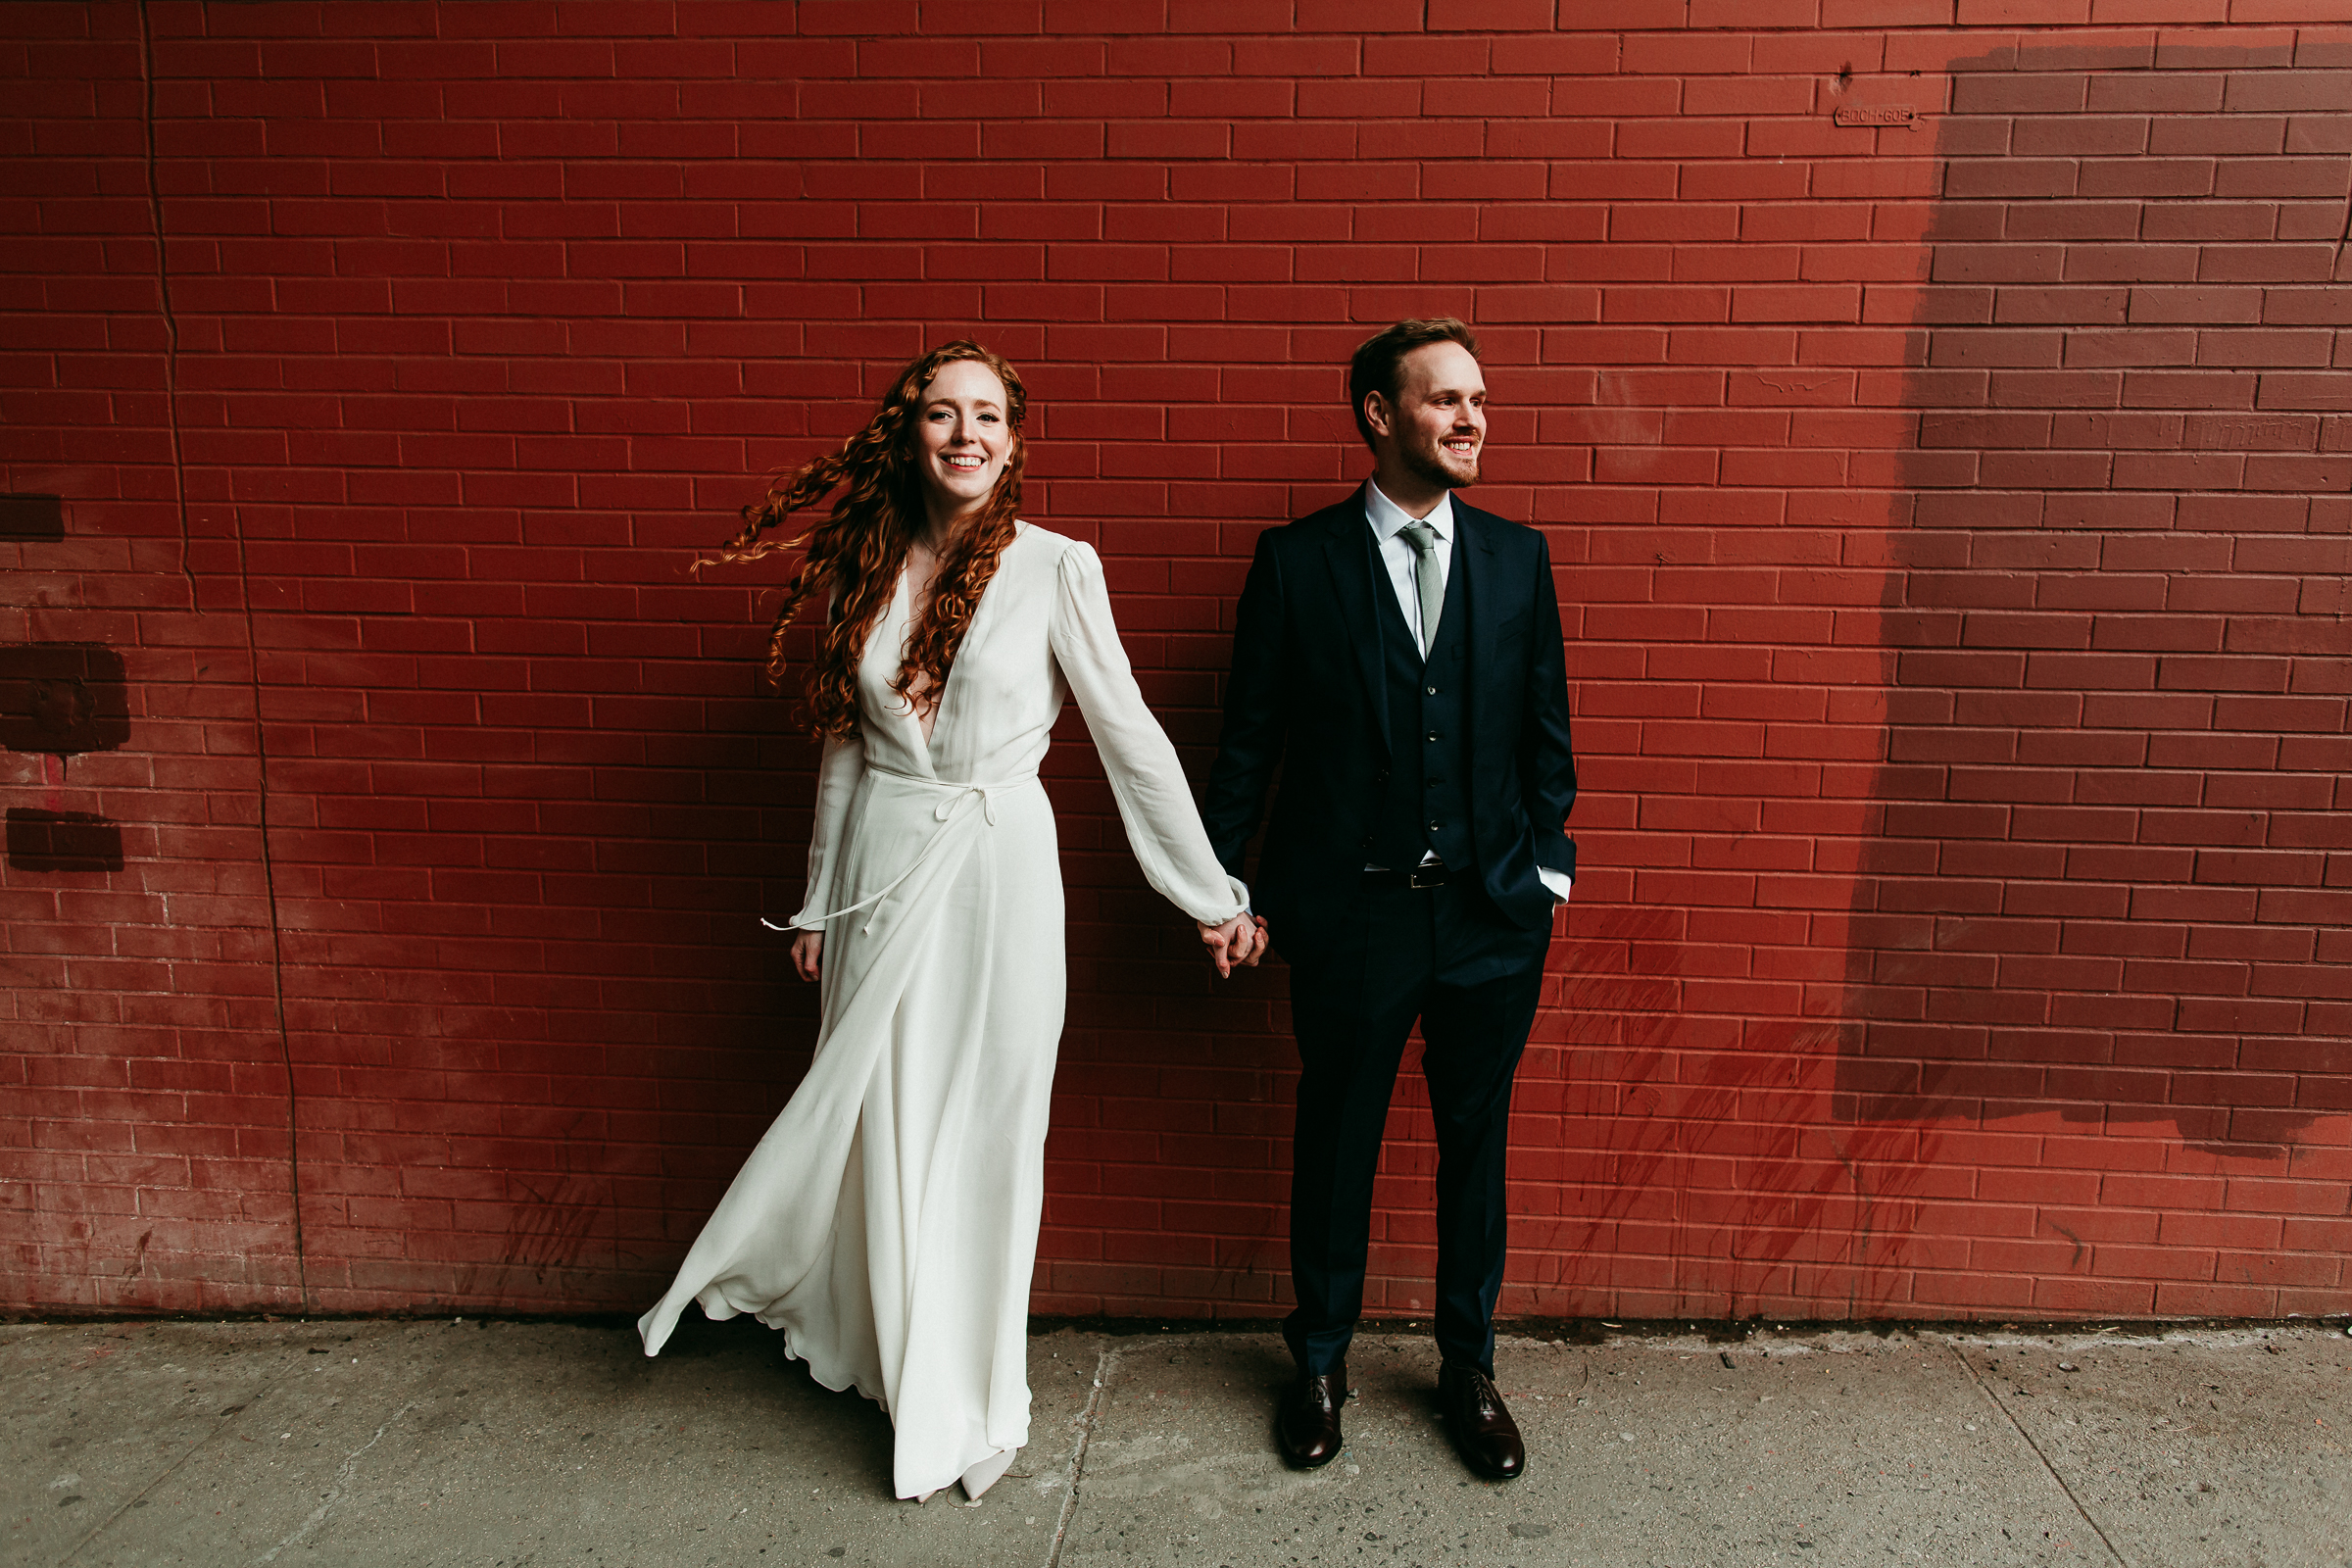 Freemans-Restaurant-Soho-Brooklyn-Bridge-Park-Dumbo-Documentary-Wedding-Photographer-5.jpg